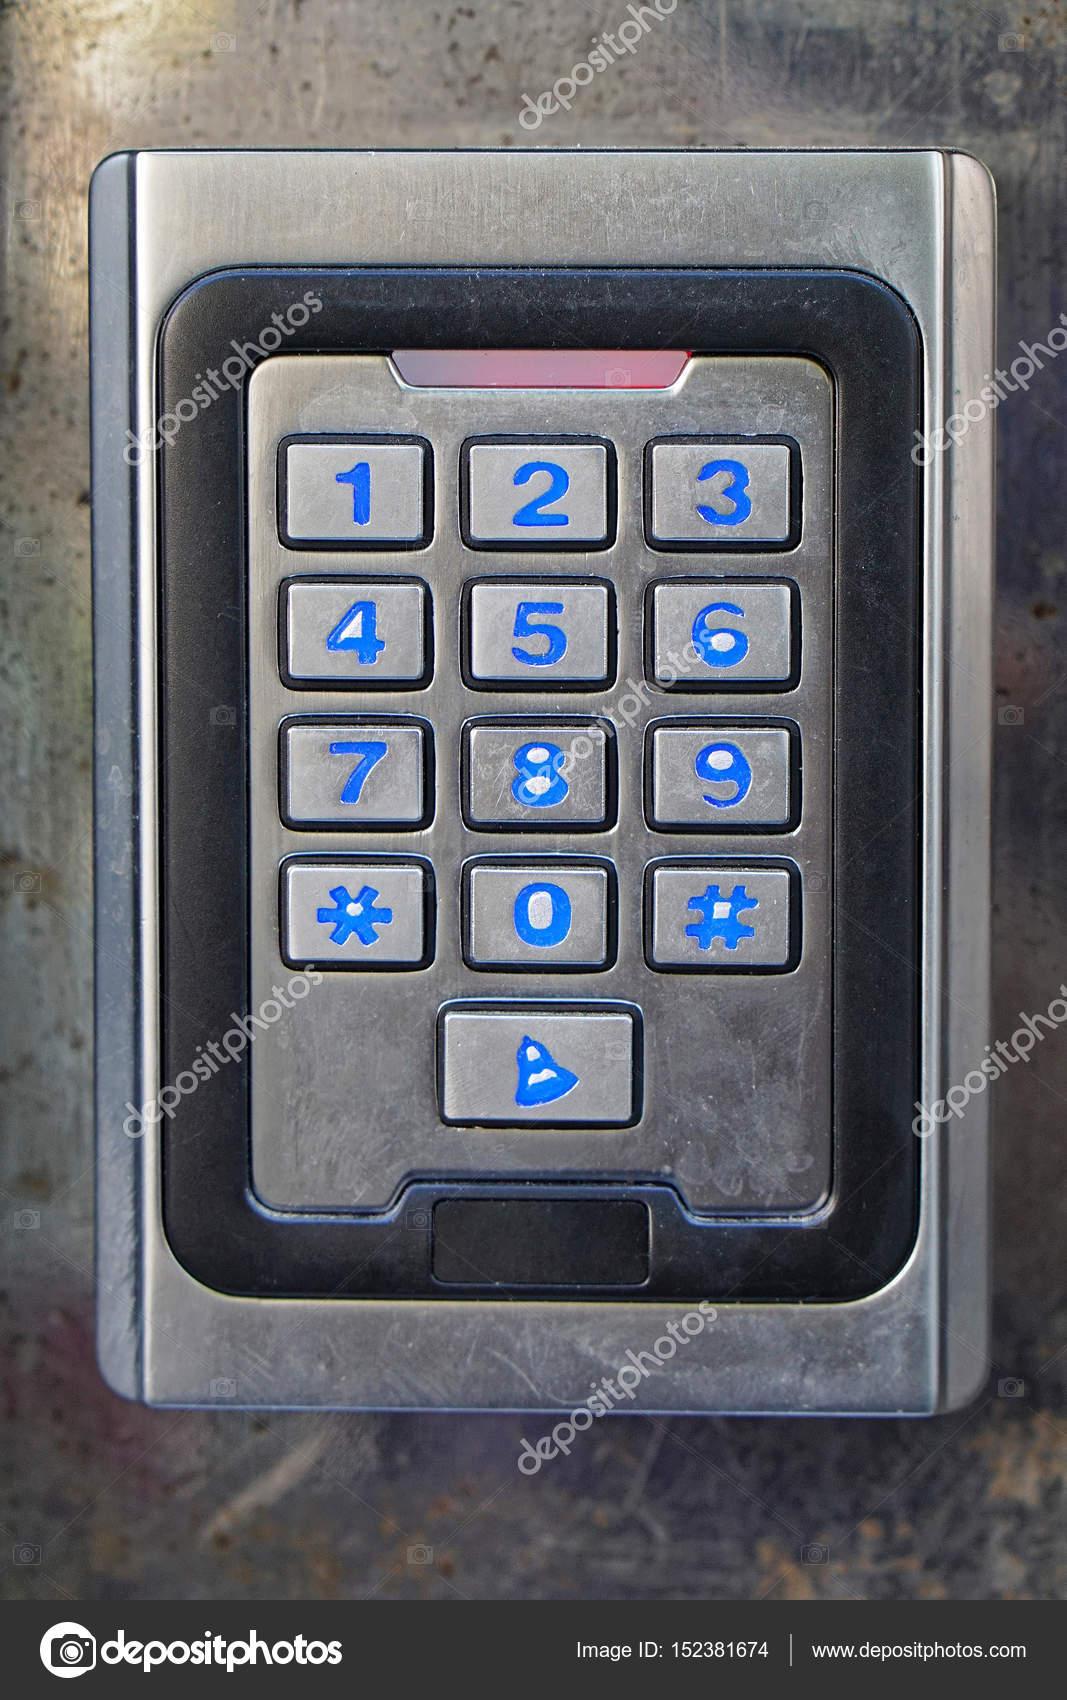 security keypad images free